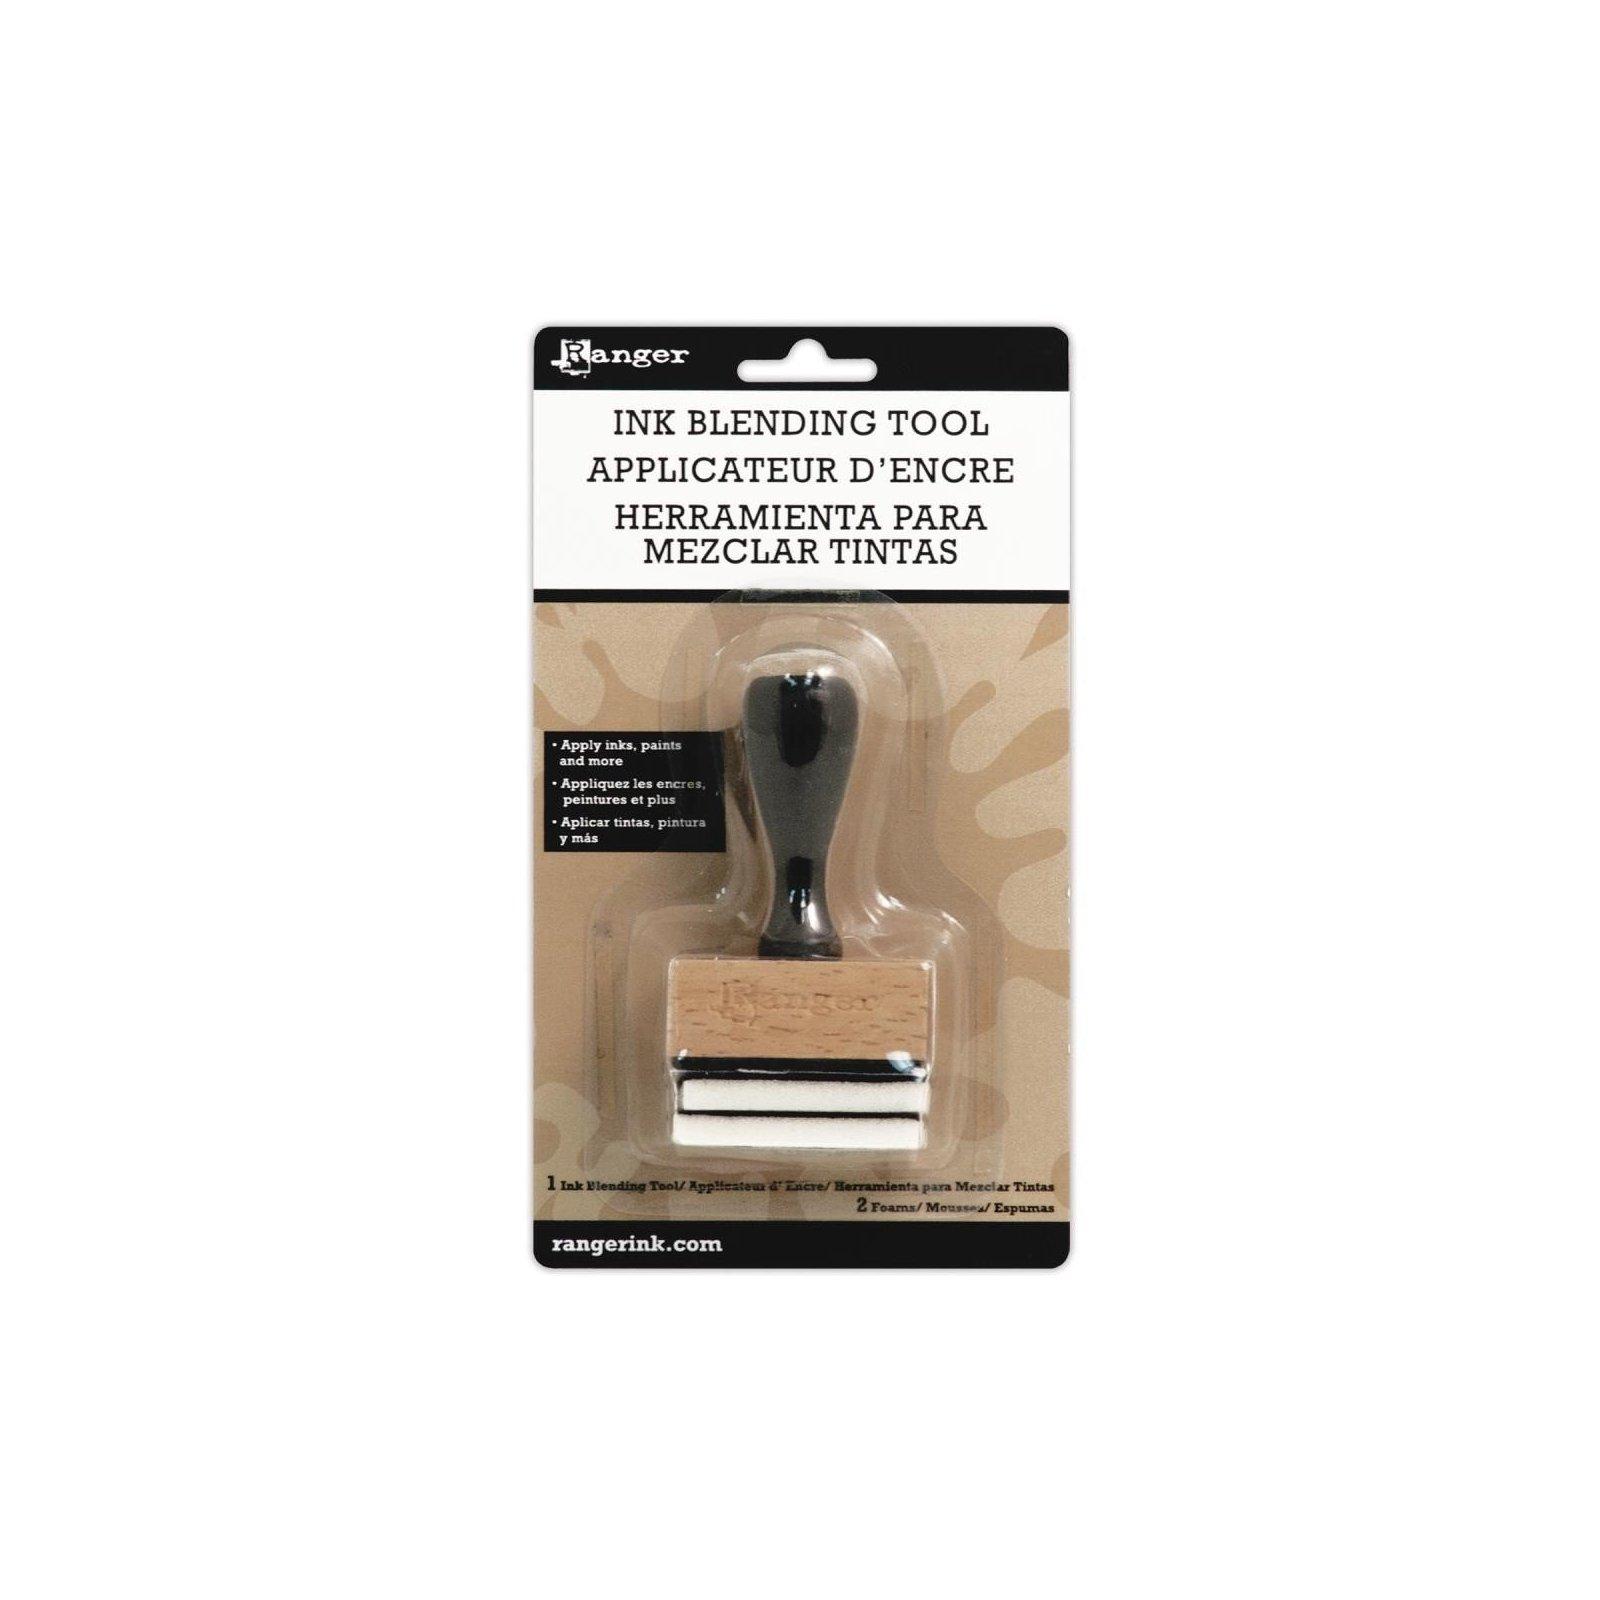 Applicateur d'encre en mousse - Ink Blending Tool - Ranger